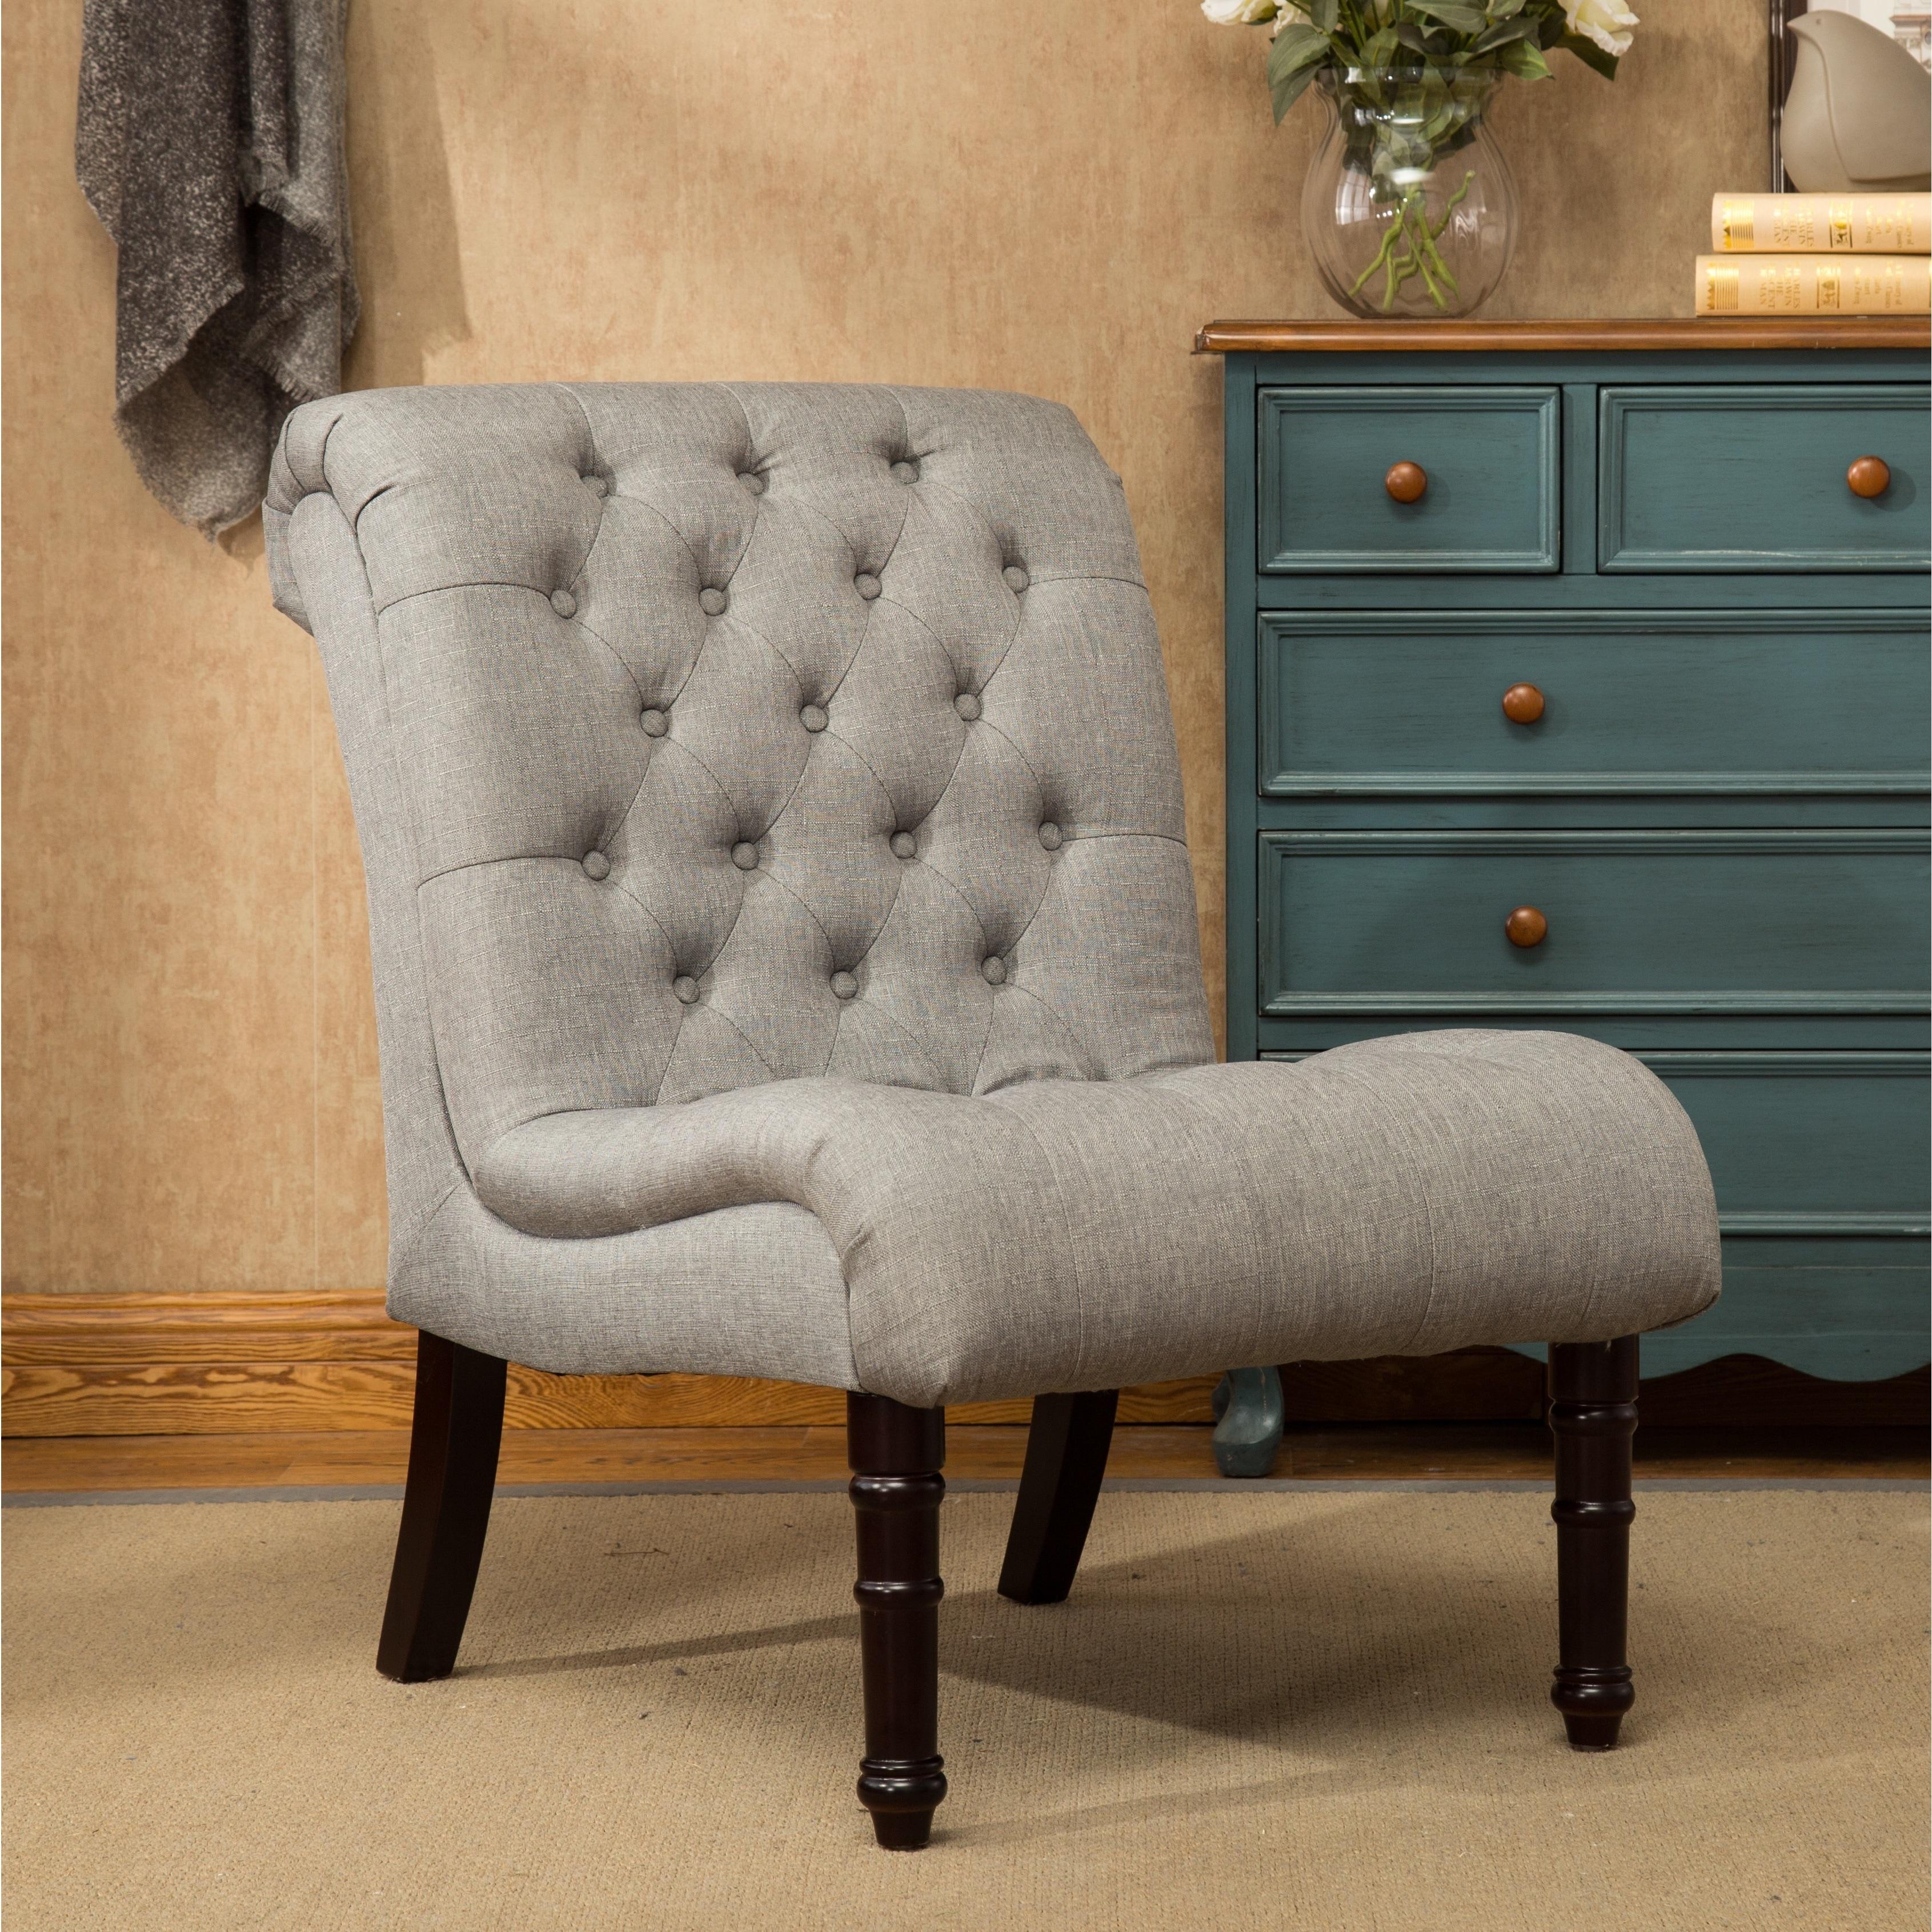 Shop Rouen Grey Fabric Button Tufted Armless Slipper Chair